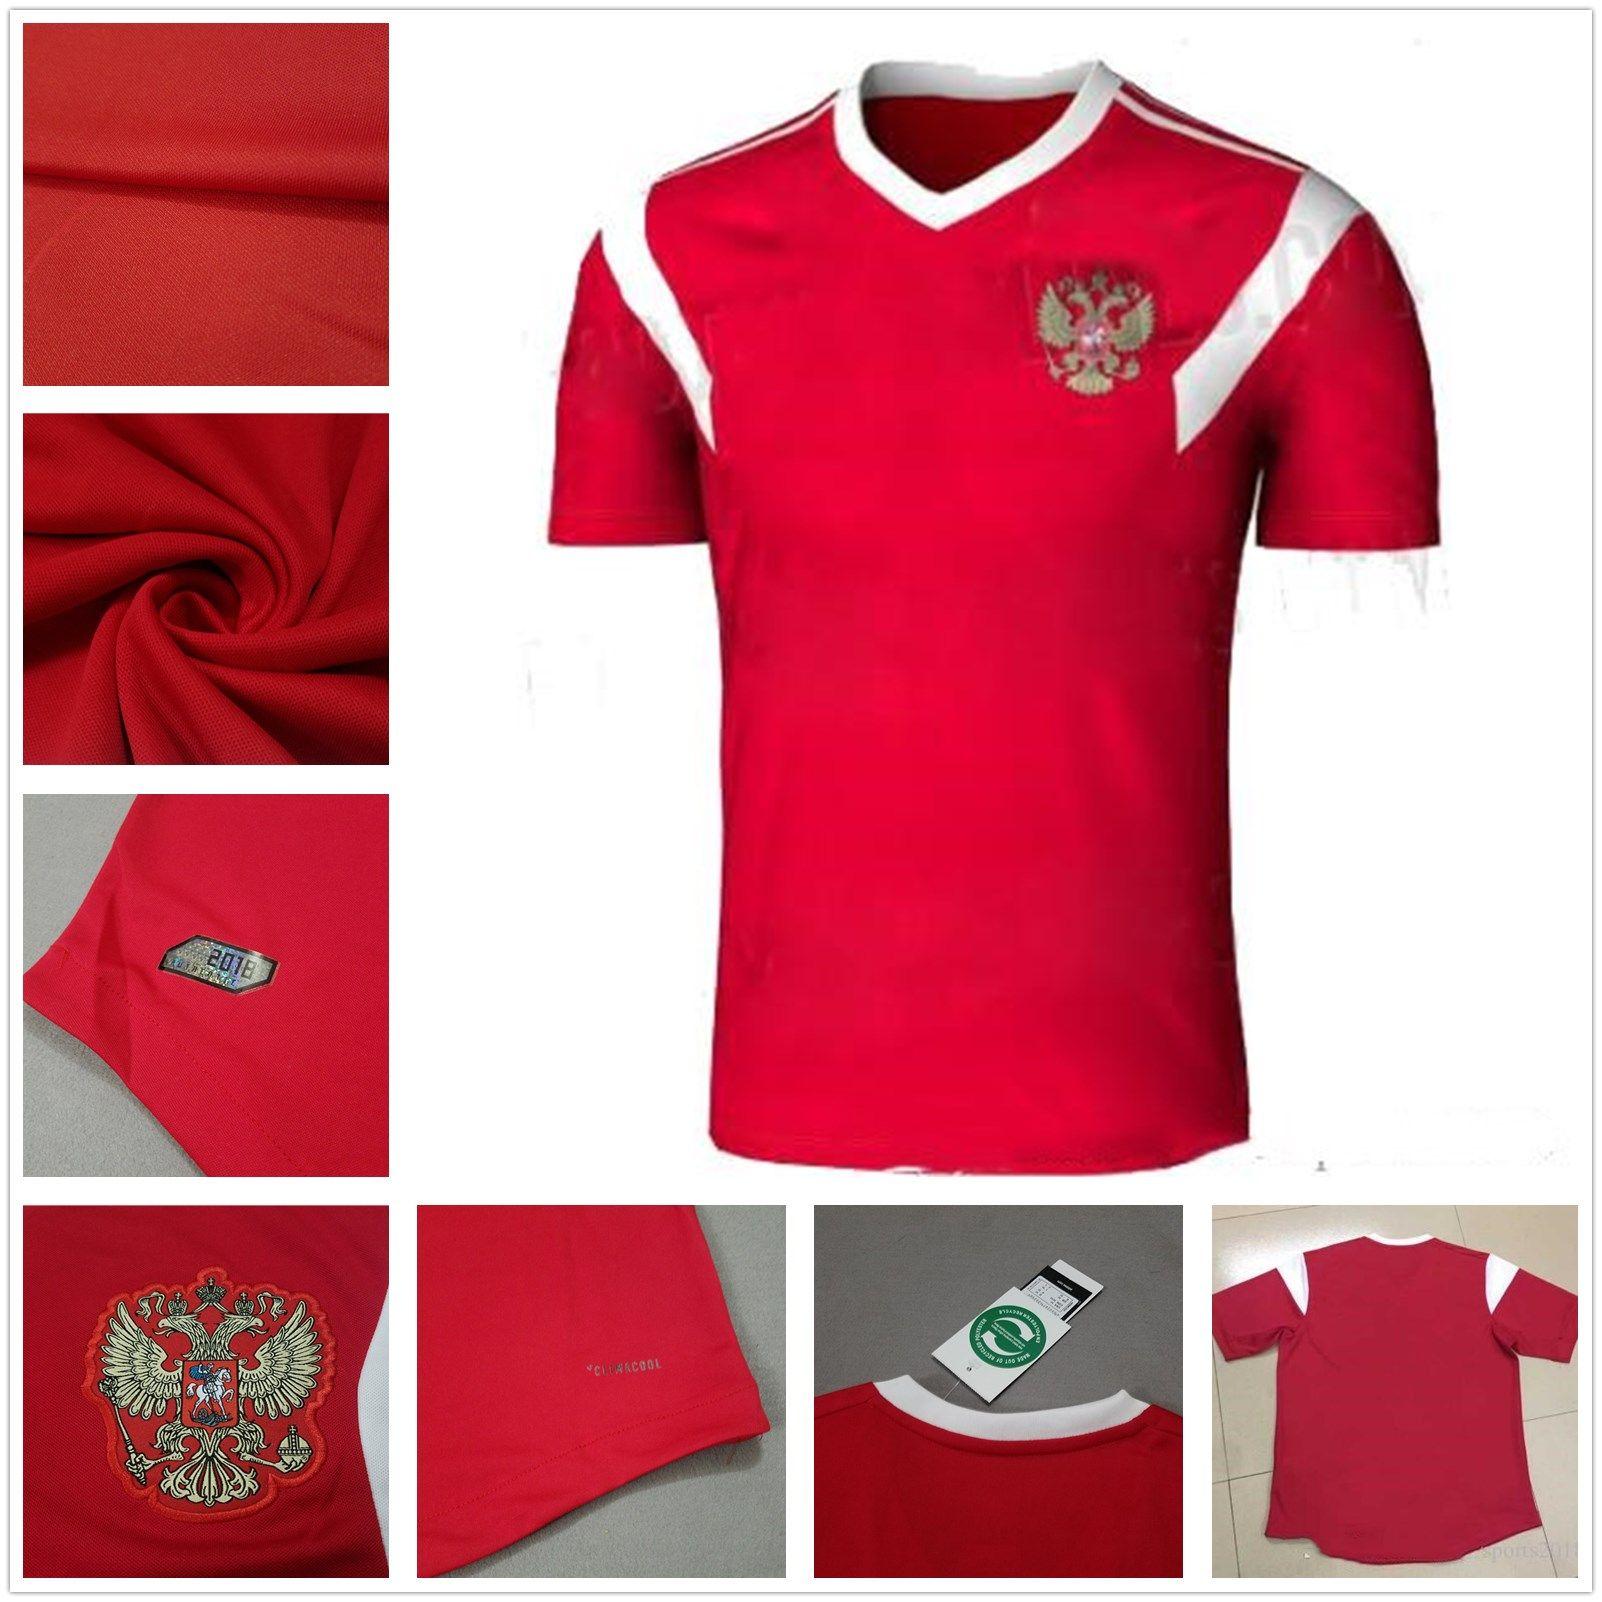 2018 world cup russia jerseys 10 arshavin 11 kerzhakov 14 pavlyuchenko 10 dzagoev home red jersey 20